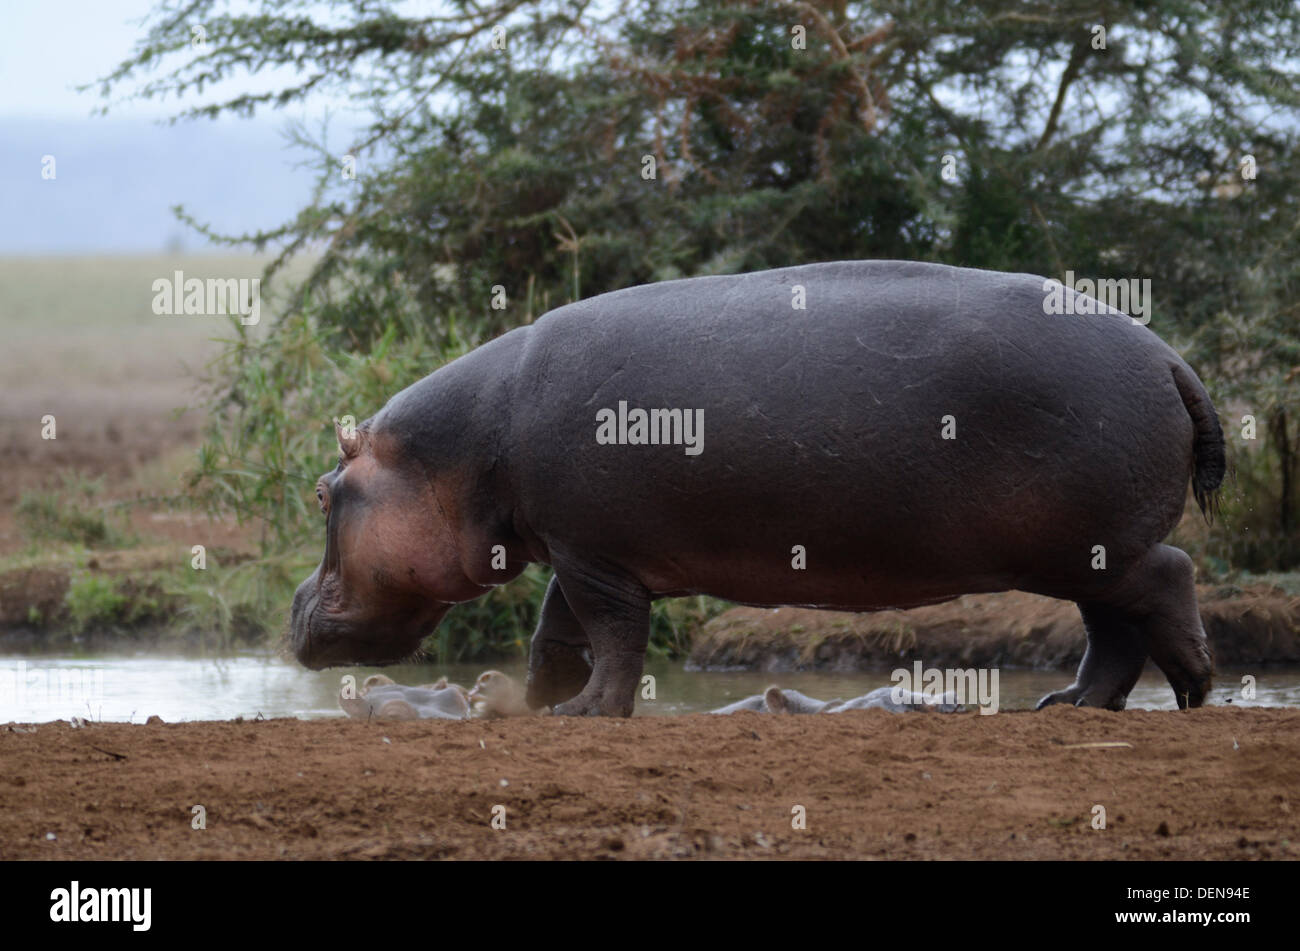 Hippopotamus (Hippopotamus amphibius), or hippo. Lake Manyara National Park, Tanzania, East Africa - Stock Image